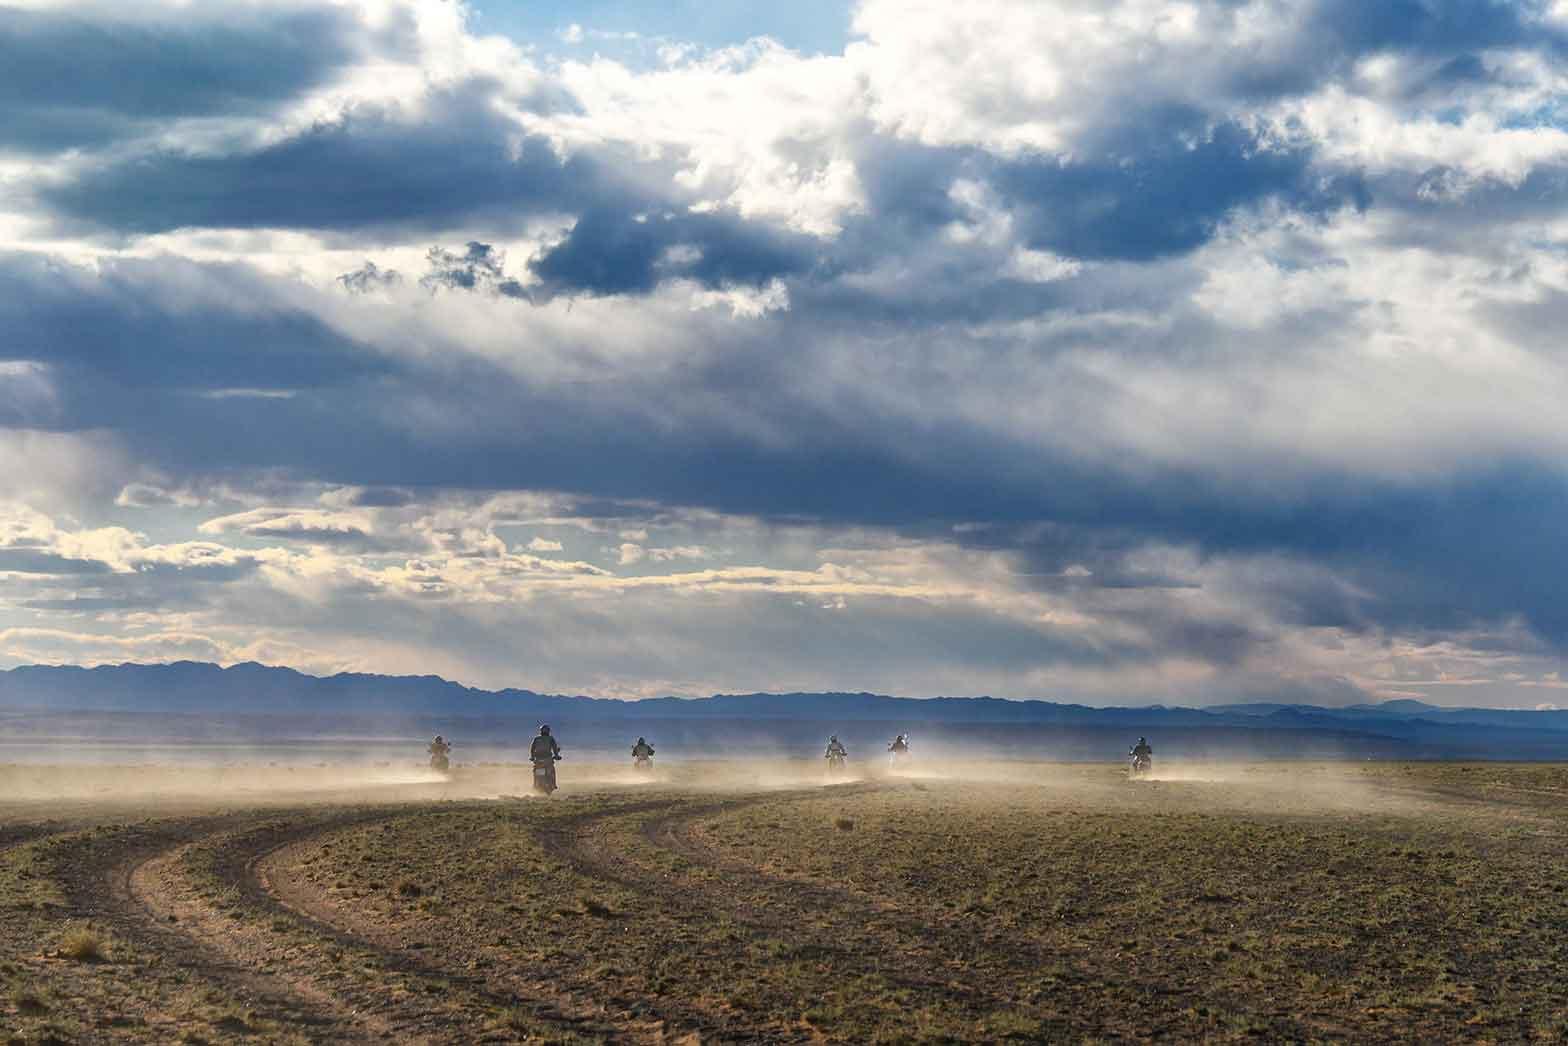 The endless playground of Mongolia